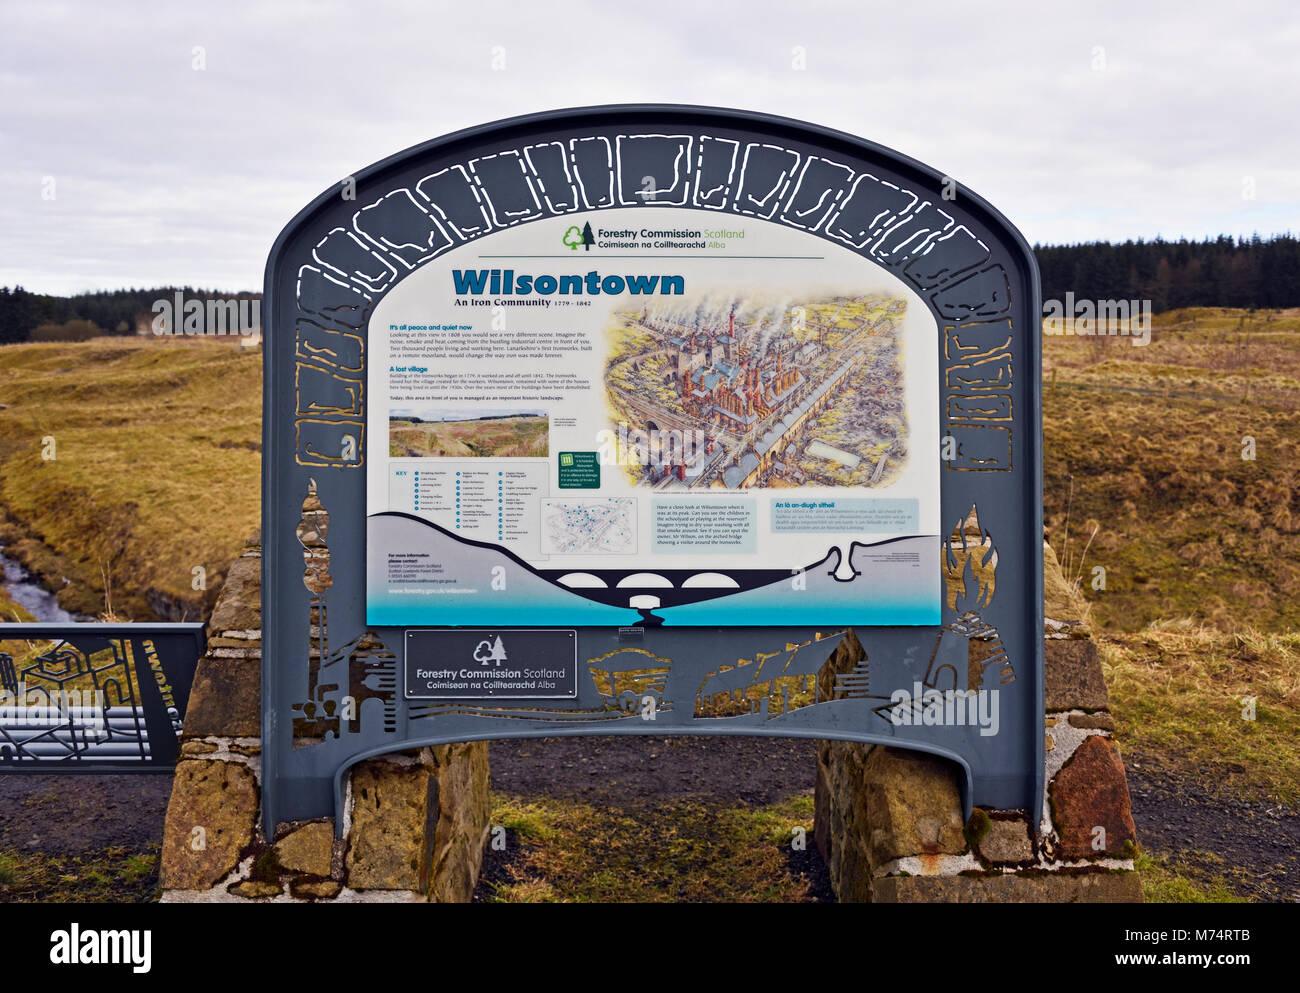 Descriptive signboard. 'Wilsontown An Iron Community 1779 - 1842.' Wilsontown, Forth, Lanarkshire, Scotland, - Stock Image